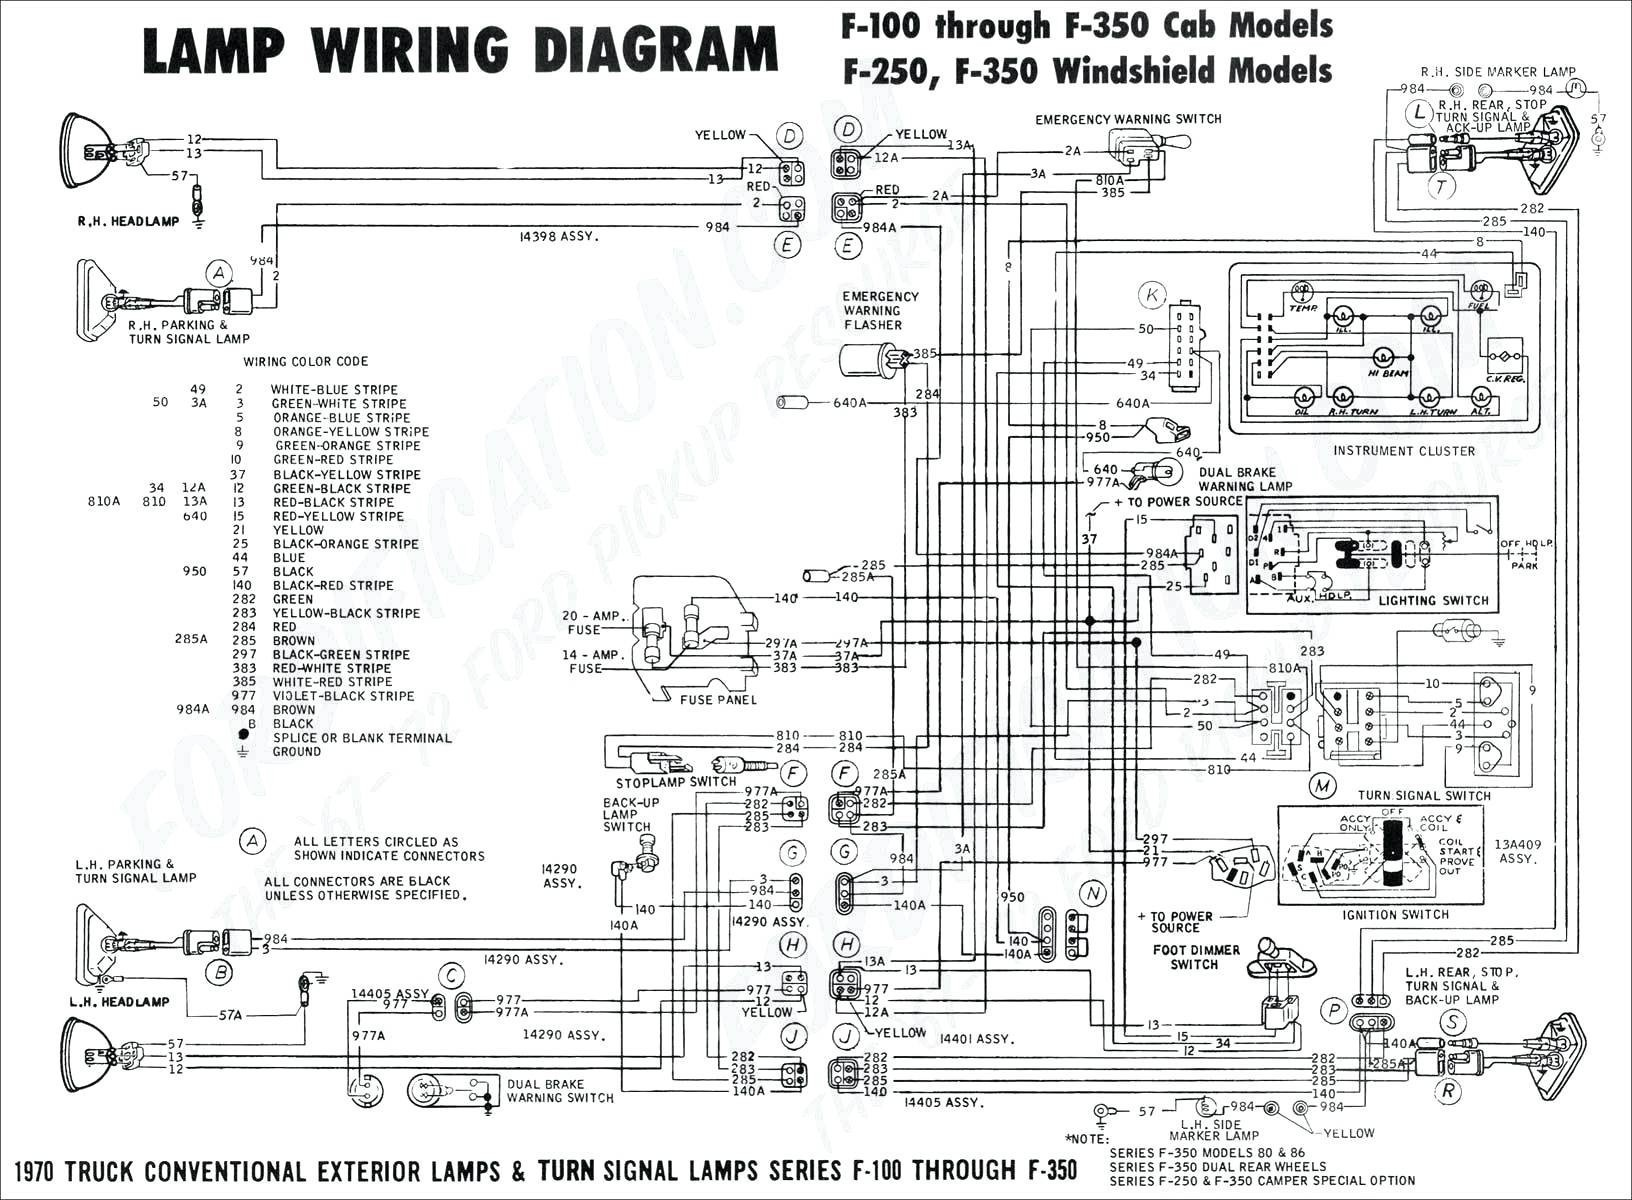 Ez Go Txt 36 Volt Wiring Diagram Inspirational Ezgo 36 Volt Charger Wiring